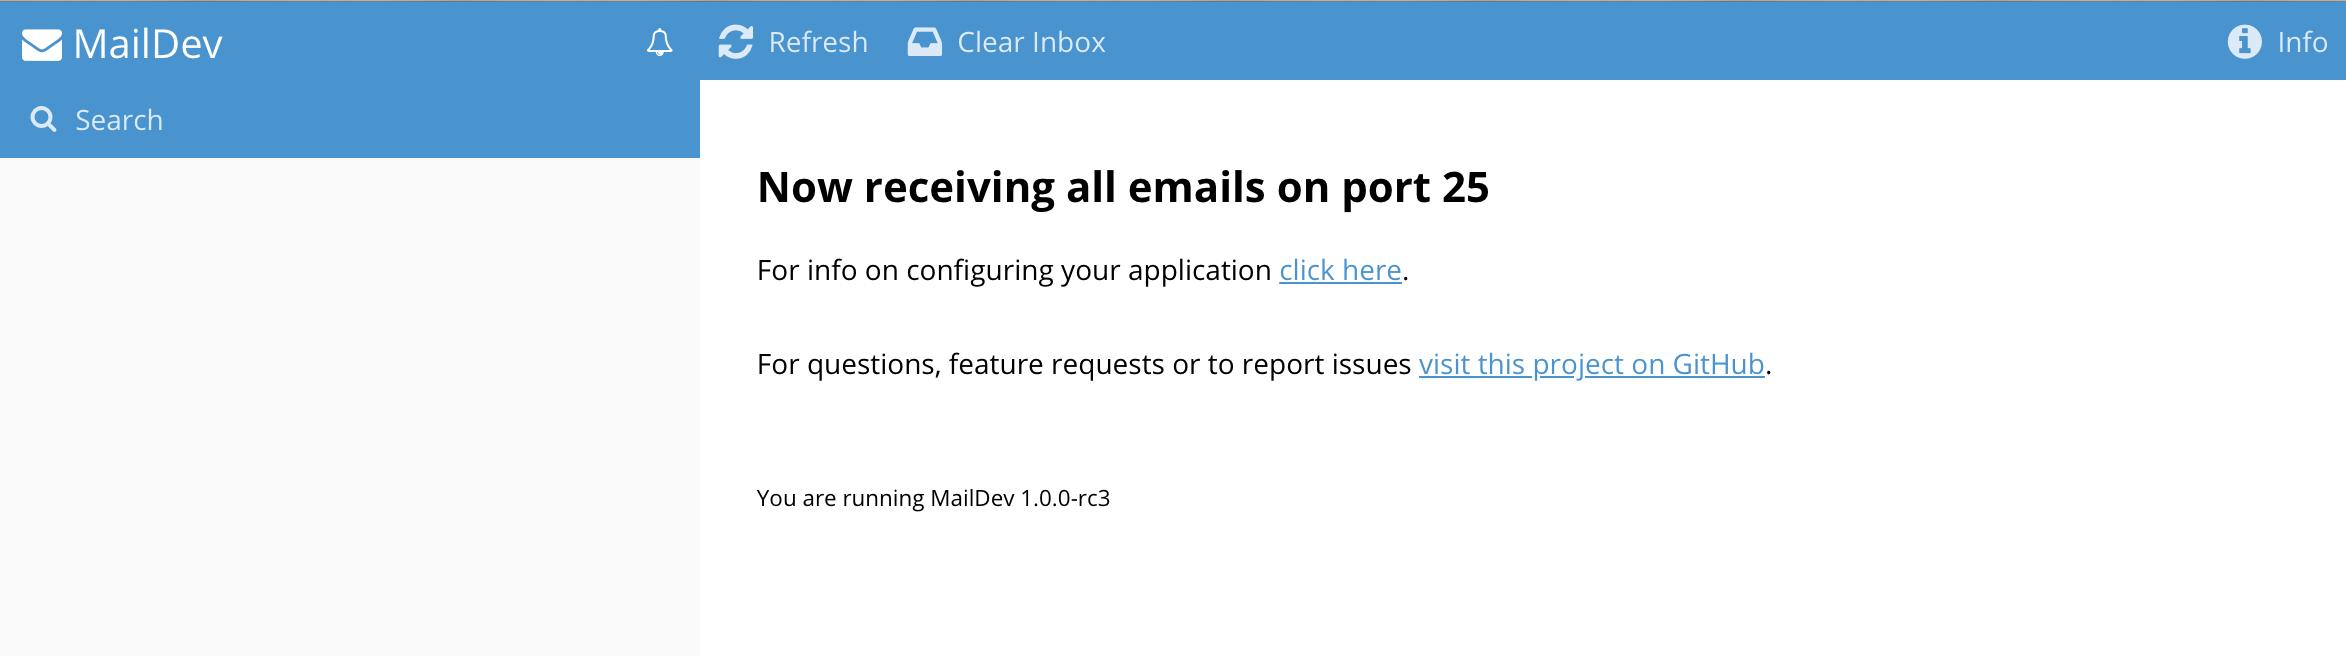 MailDev.png